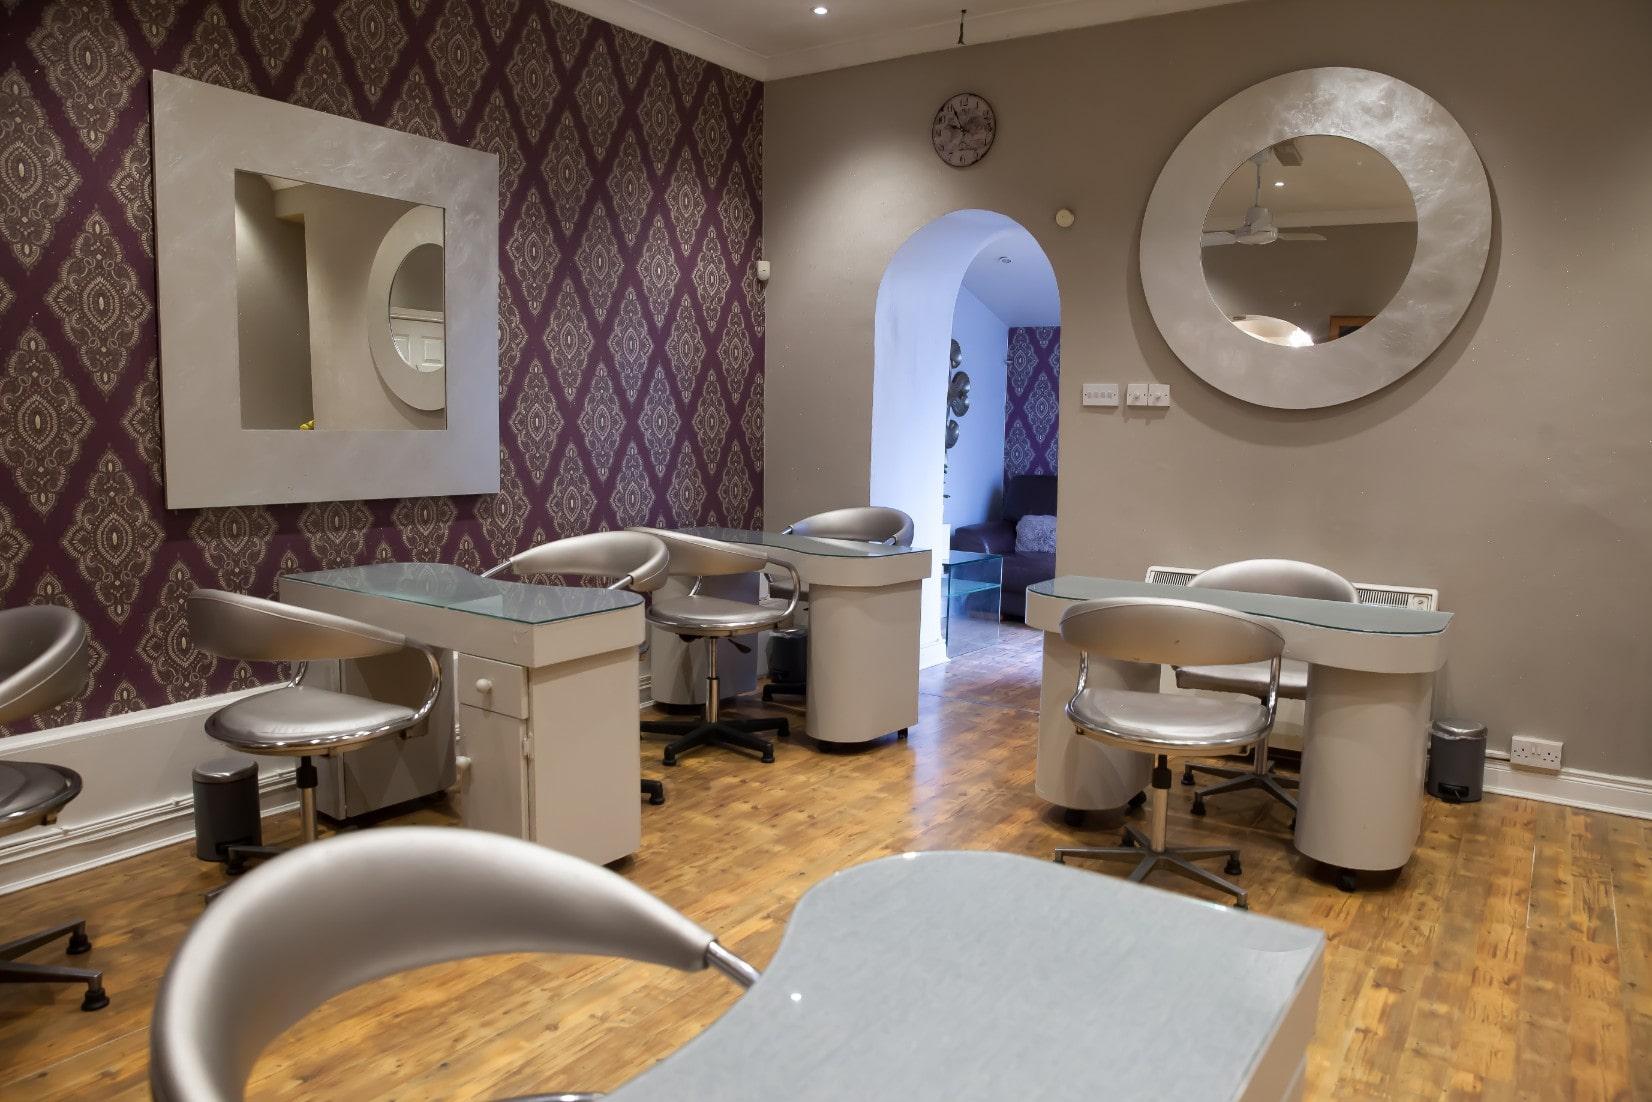 Blue Moon Beauty Salon nail services area